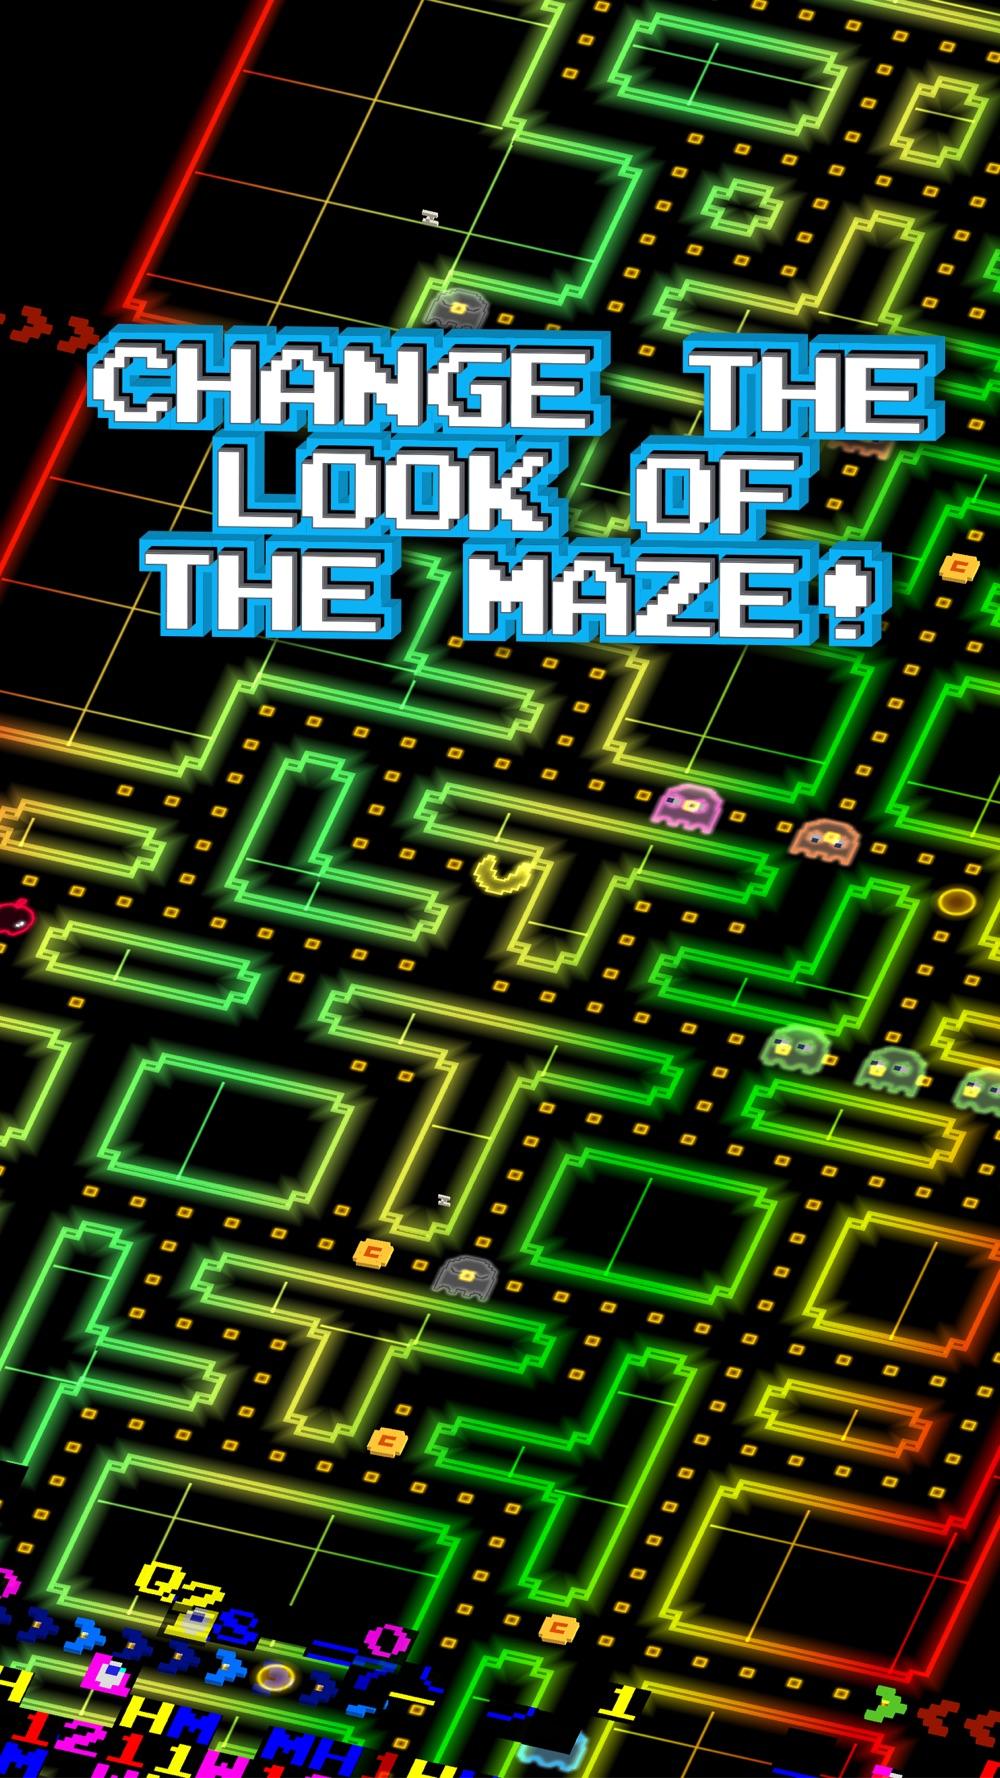 PAC-MAN 256 - Endless Arcade Maze hack tool